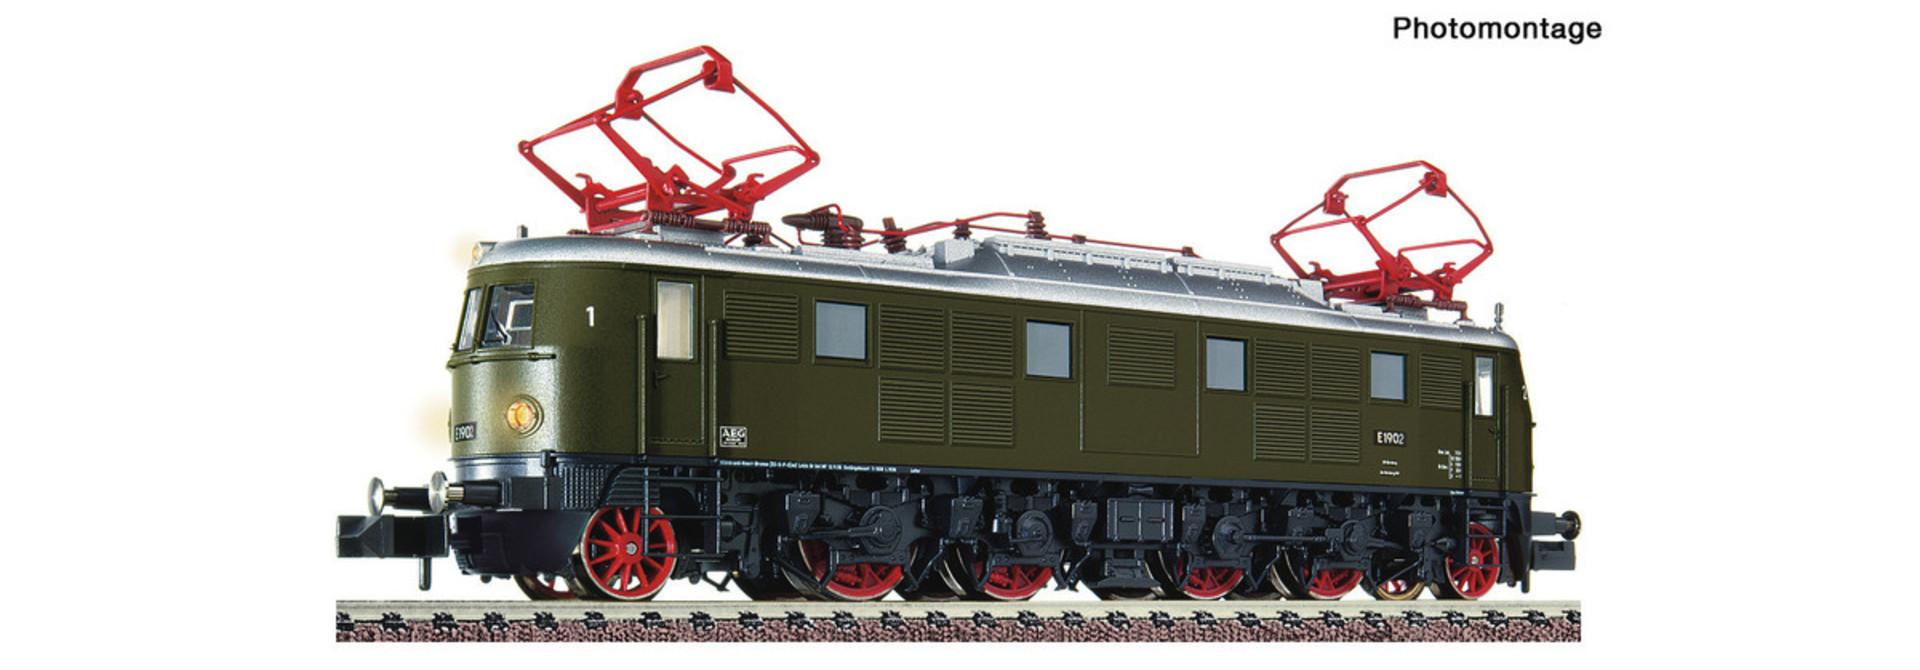 731905 Elektrische locomotief E 19 02